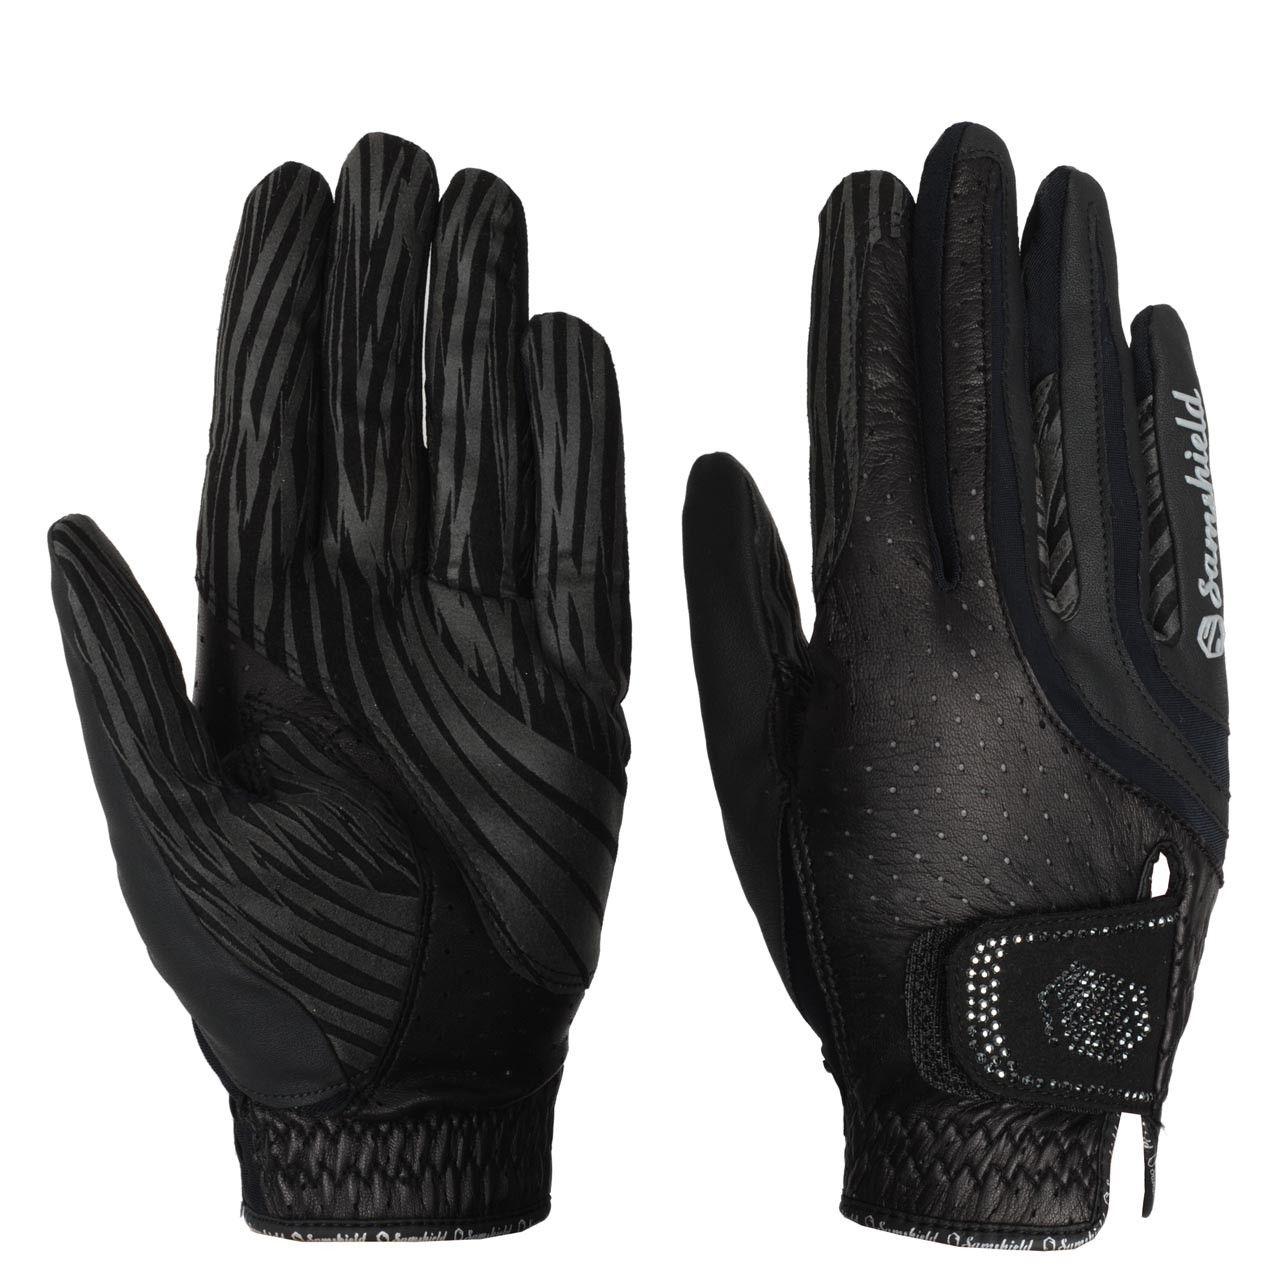 Samshield handschoenen Swarovski zwart maat:7